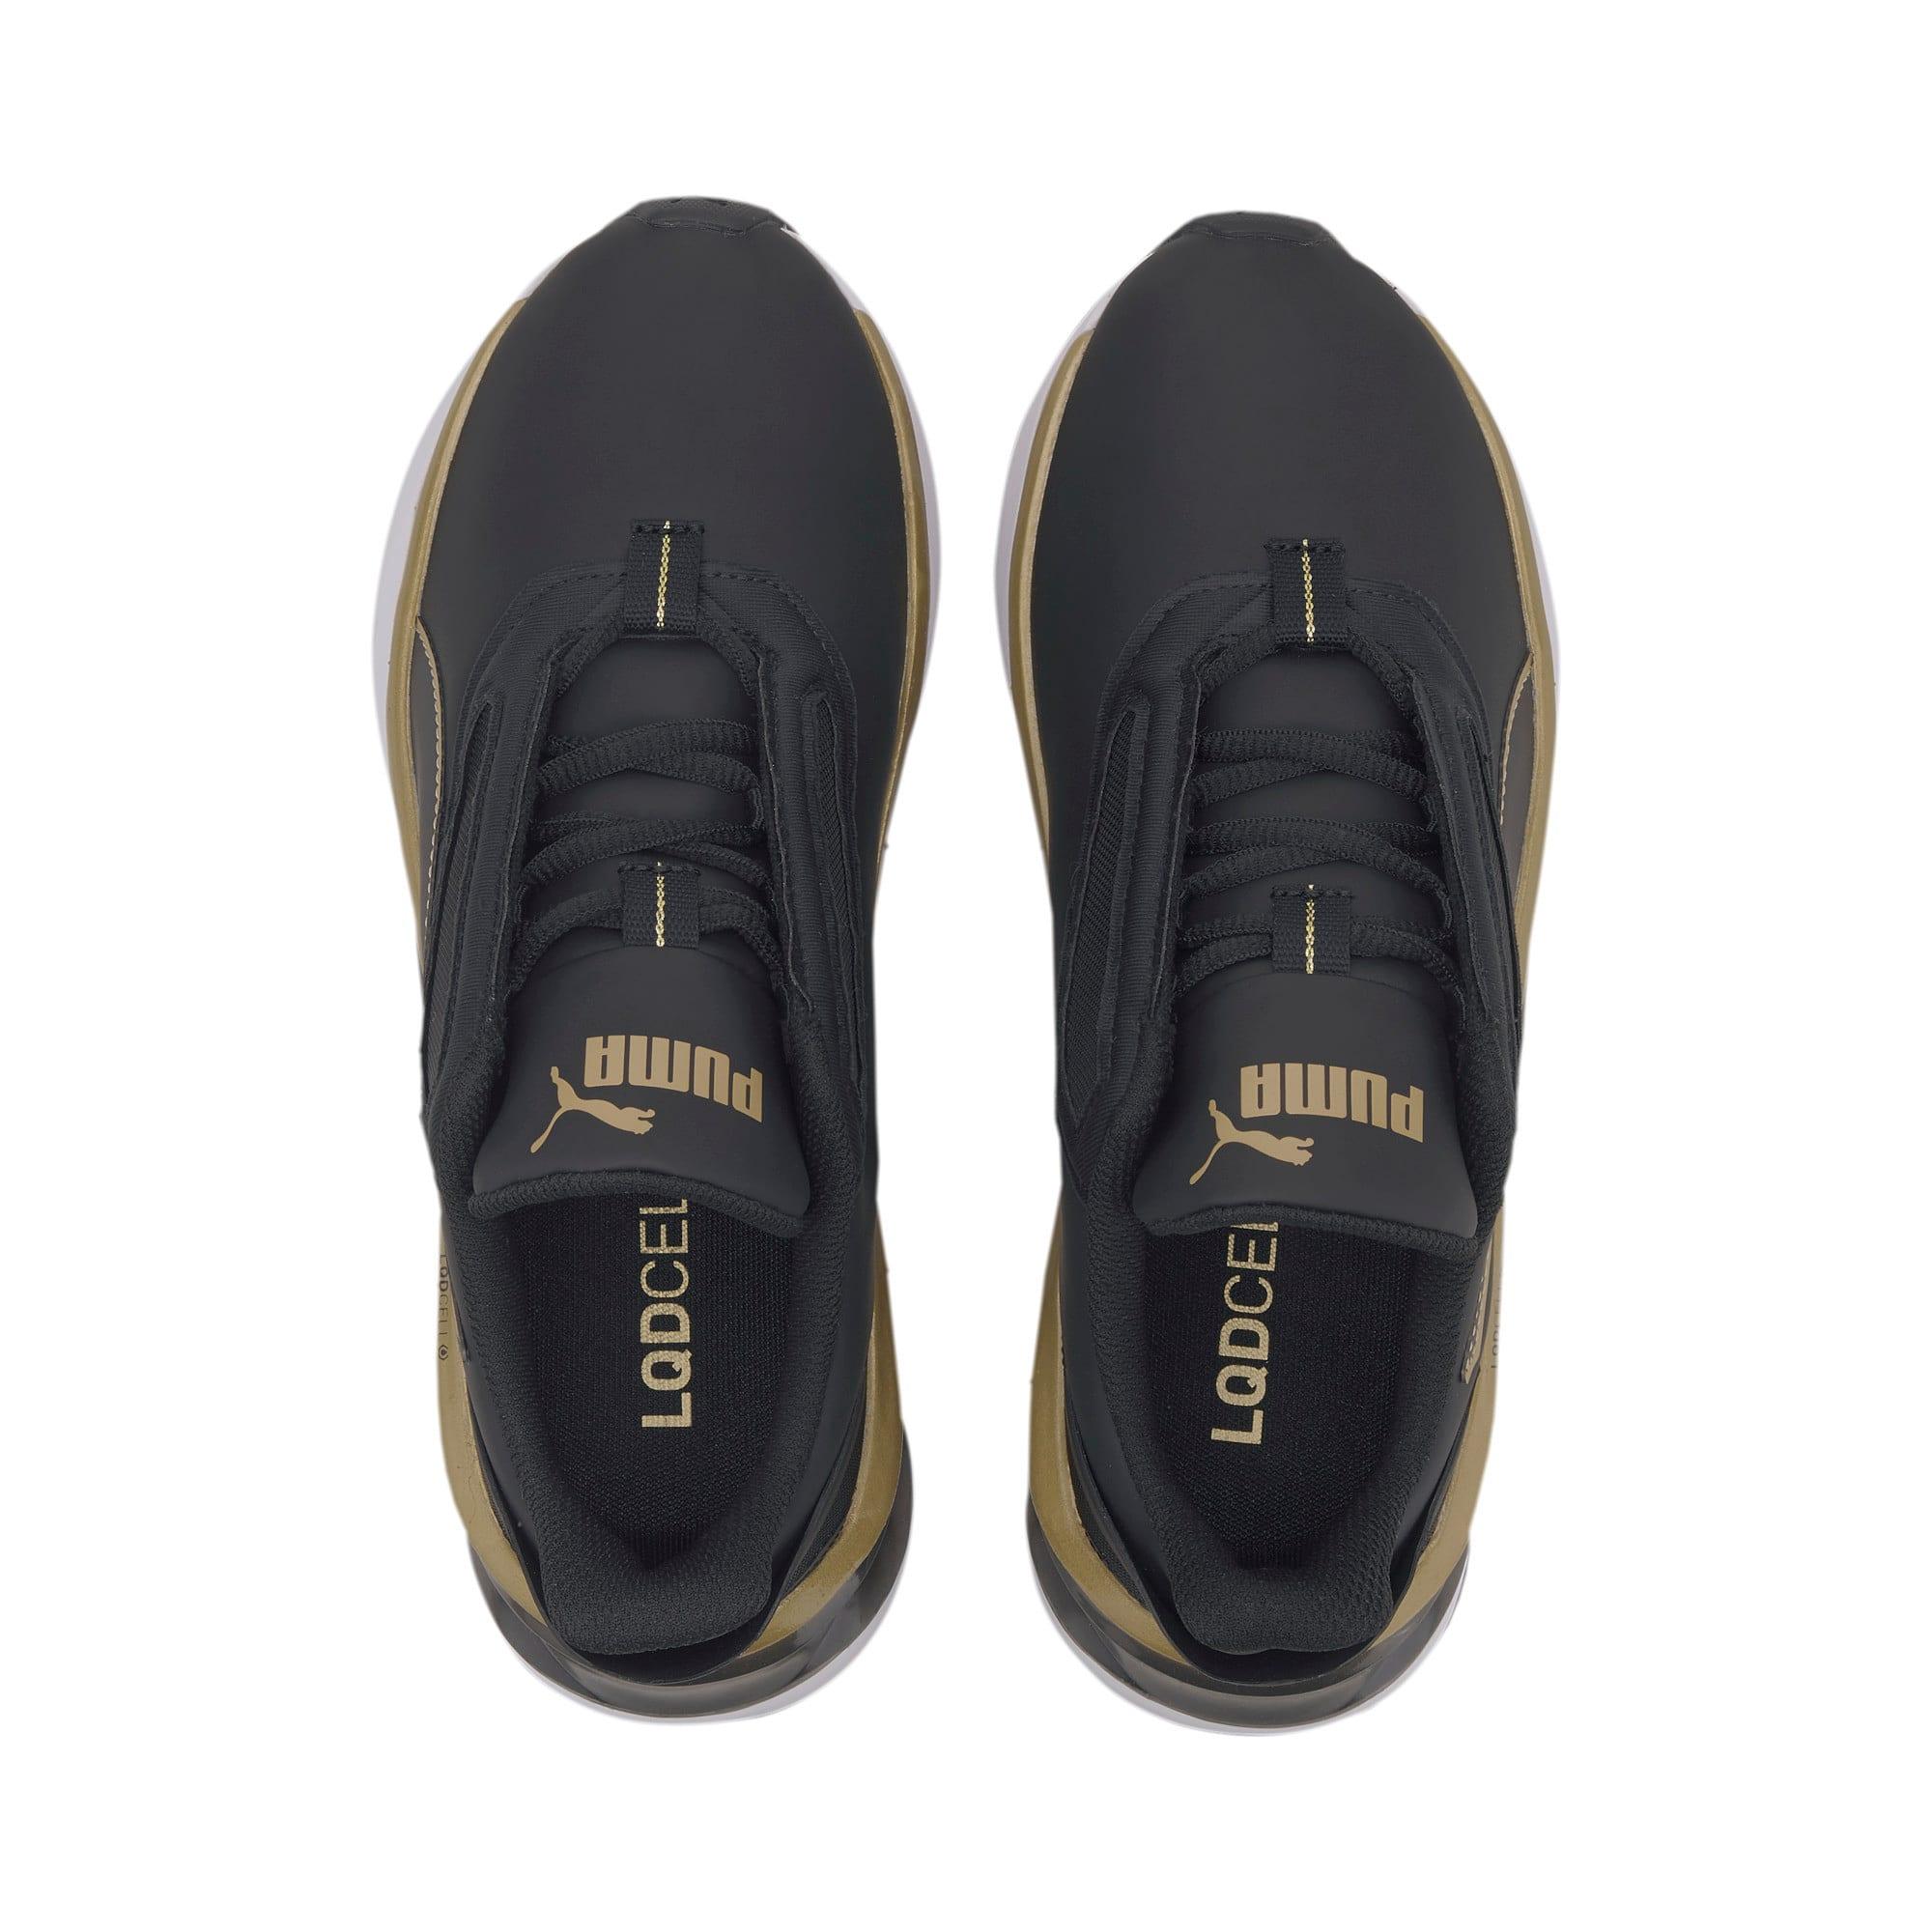 Thumbnail 6 of LQDCELL Shatter XT Matte Women's Training Shoes, Puma Black-Puma Team Gold, medium